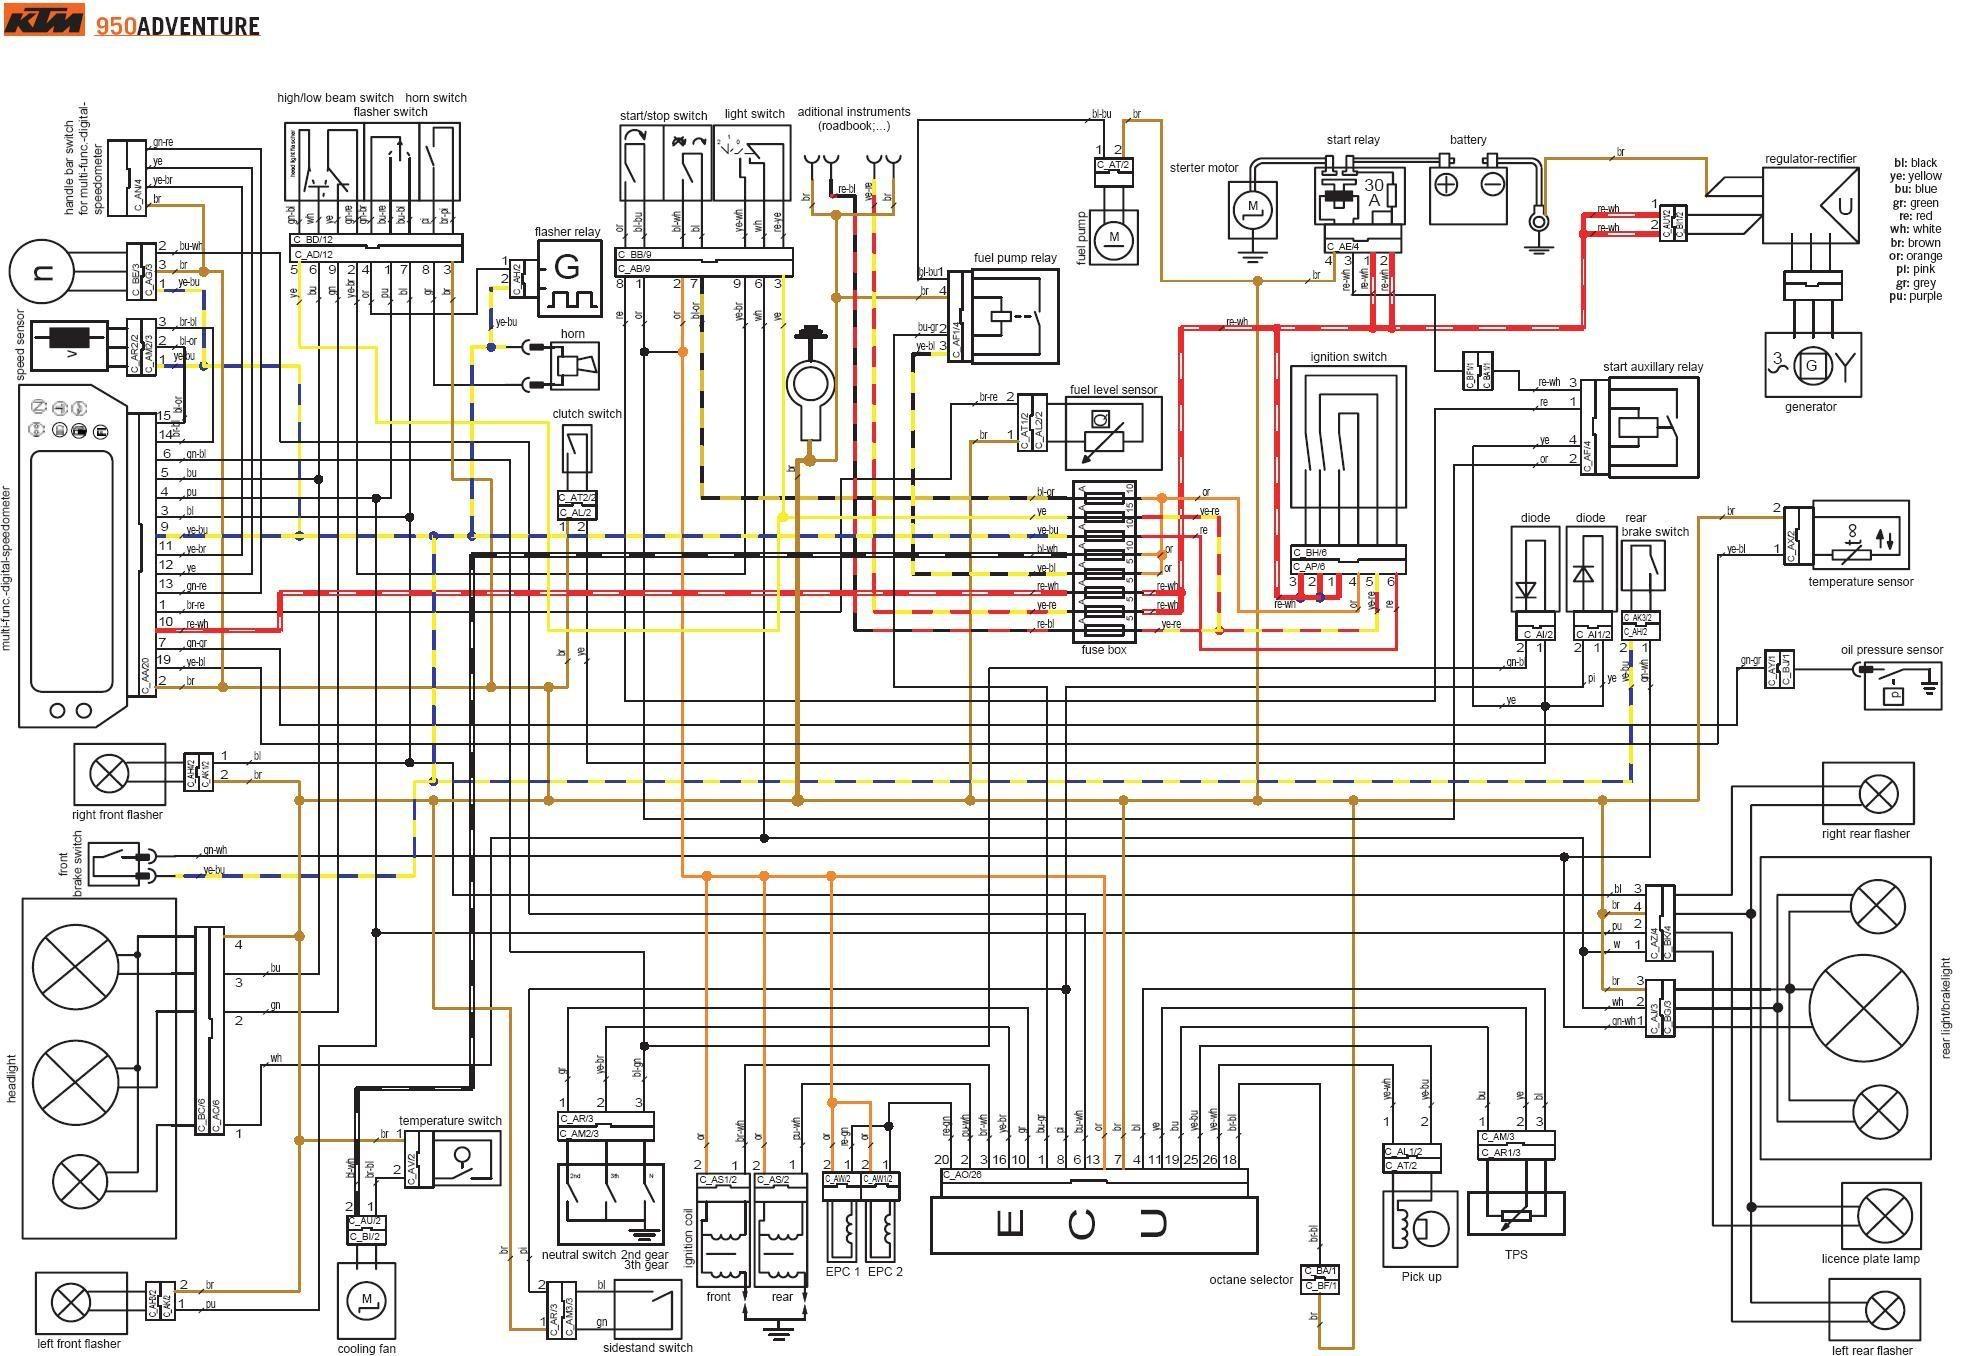 2007 Honda Cbr600rr Wiring Diagram Explained Diagrams 05 2006 Vfr800 Schematics Data U2022 Zb50